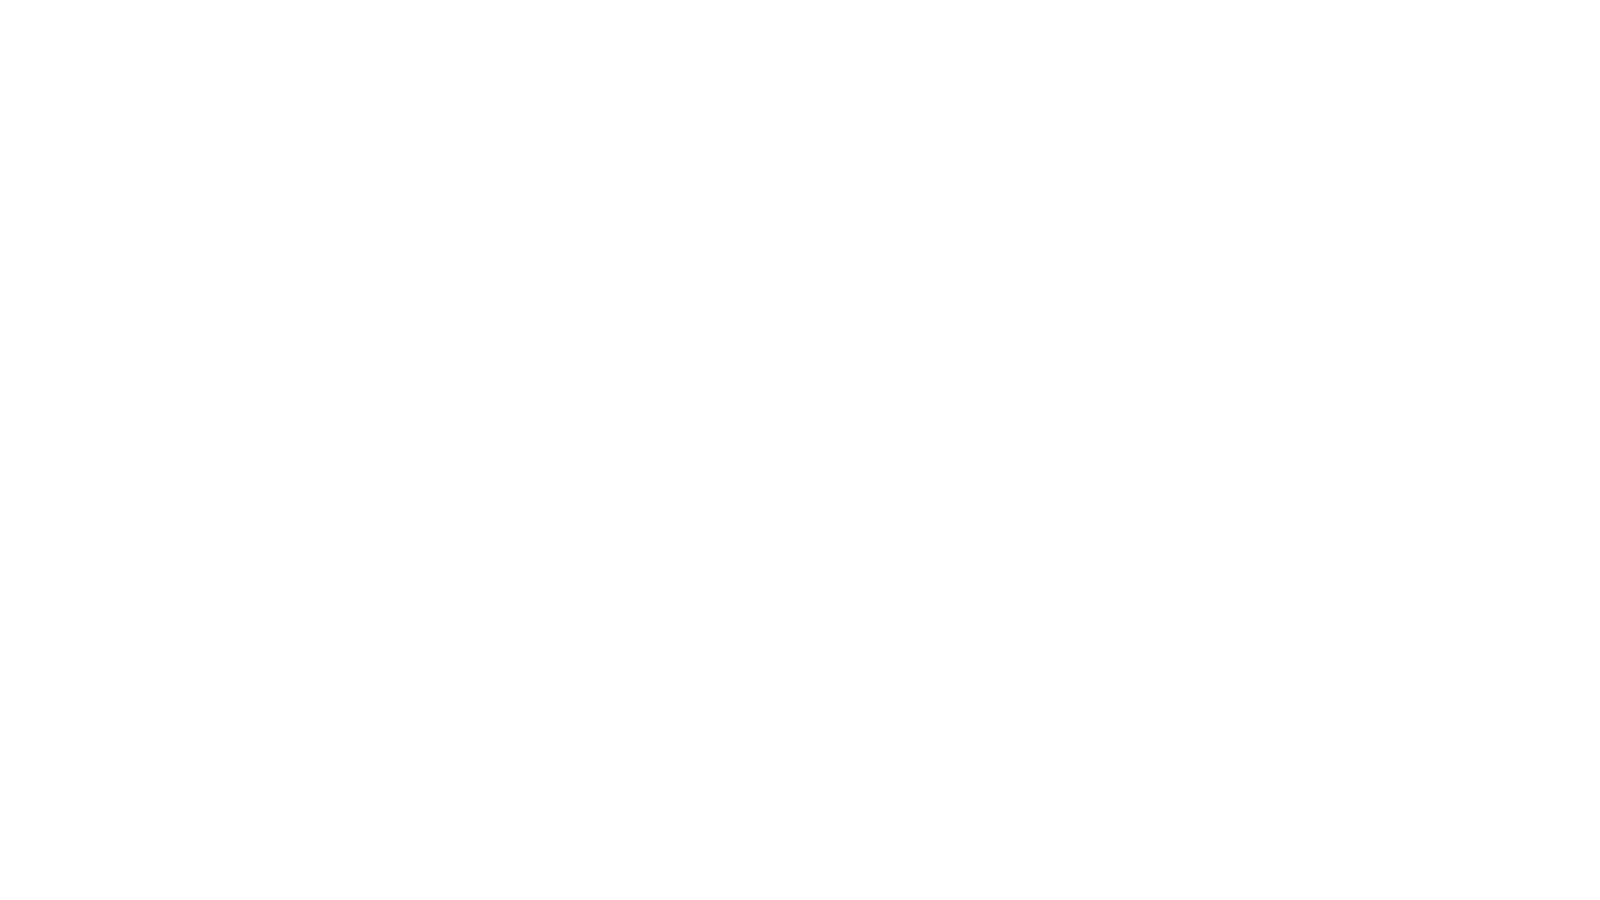 "Poesia ""Solitudine"", inserita nella mia prima raccolta poetica ""Il mio girotondo di emozioni"" edita da marcoserratarantolaeditore. By Elenia Stefani  💌ISCRIVITI AL MIO CANALE YOUTUBE🎉 #eleniastefani #ilmiogirotondodiemozioni #libridaleggere #scrittrice #poesie #frasi #pensieri #libri #leggerepoesie #bookstagram #libreria  #readers #book #leggere #lettura #consiglidilettura #libriconsigliati #bookgrammer #bookstagramitalia #writer #poetess #italianpoetry #poesiaitaliana #bookinfluencer #bookblogger #bookofinstagram"